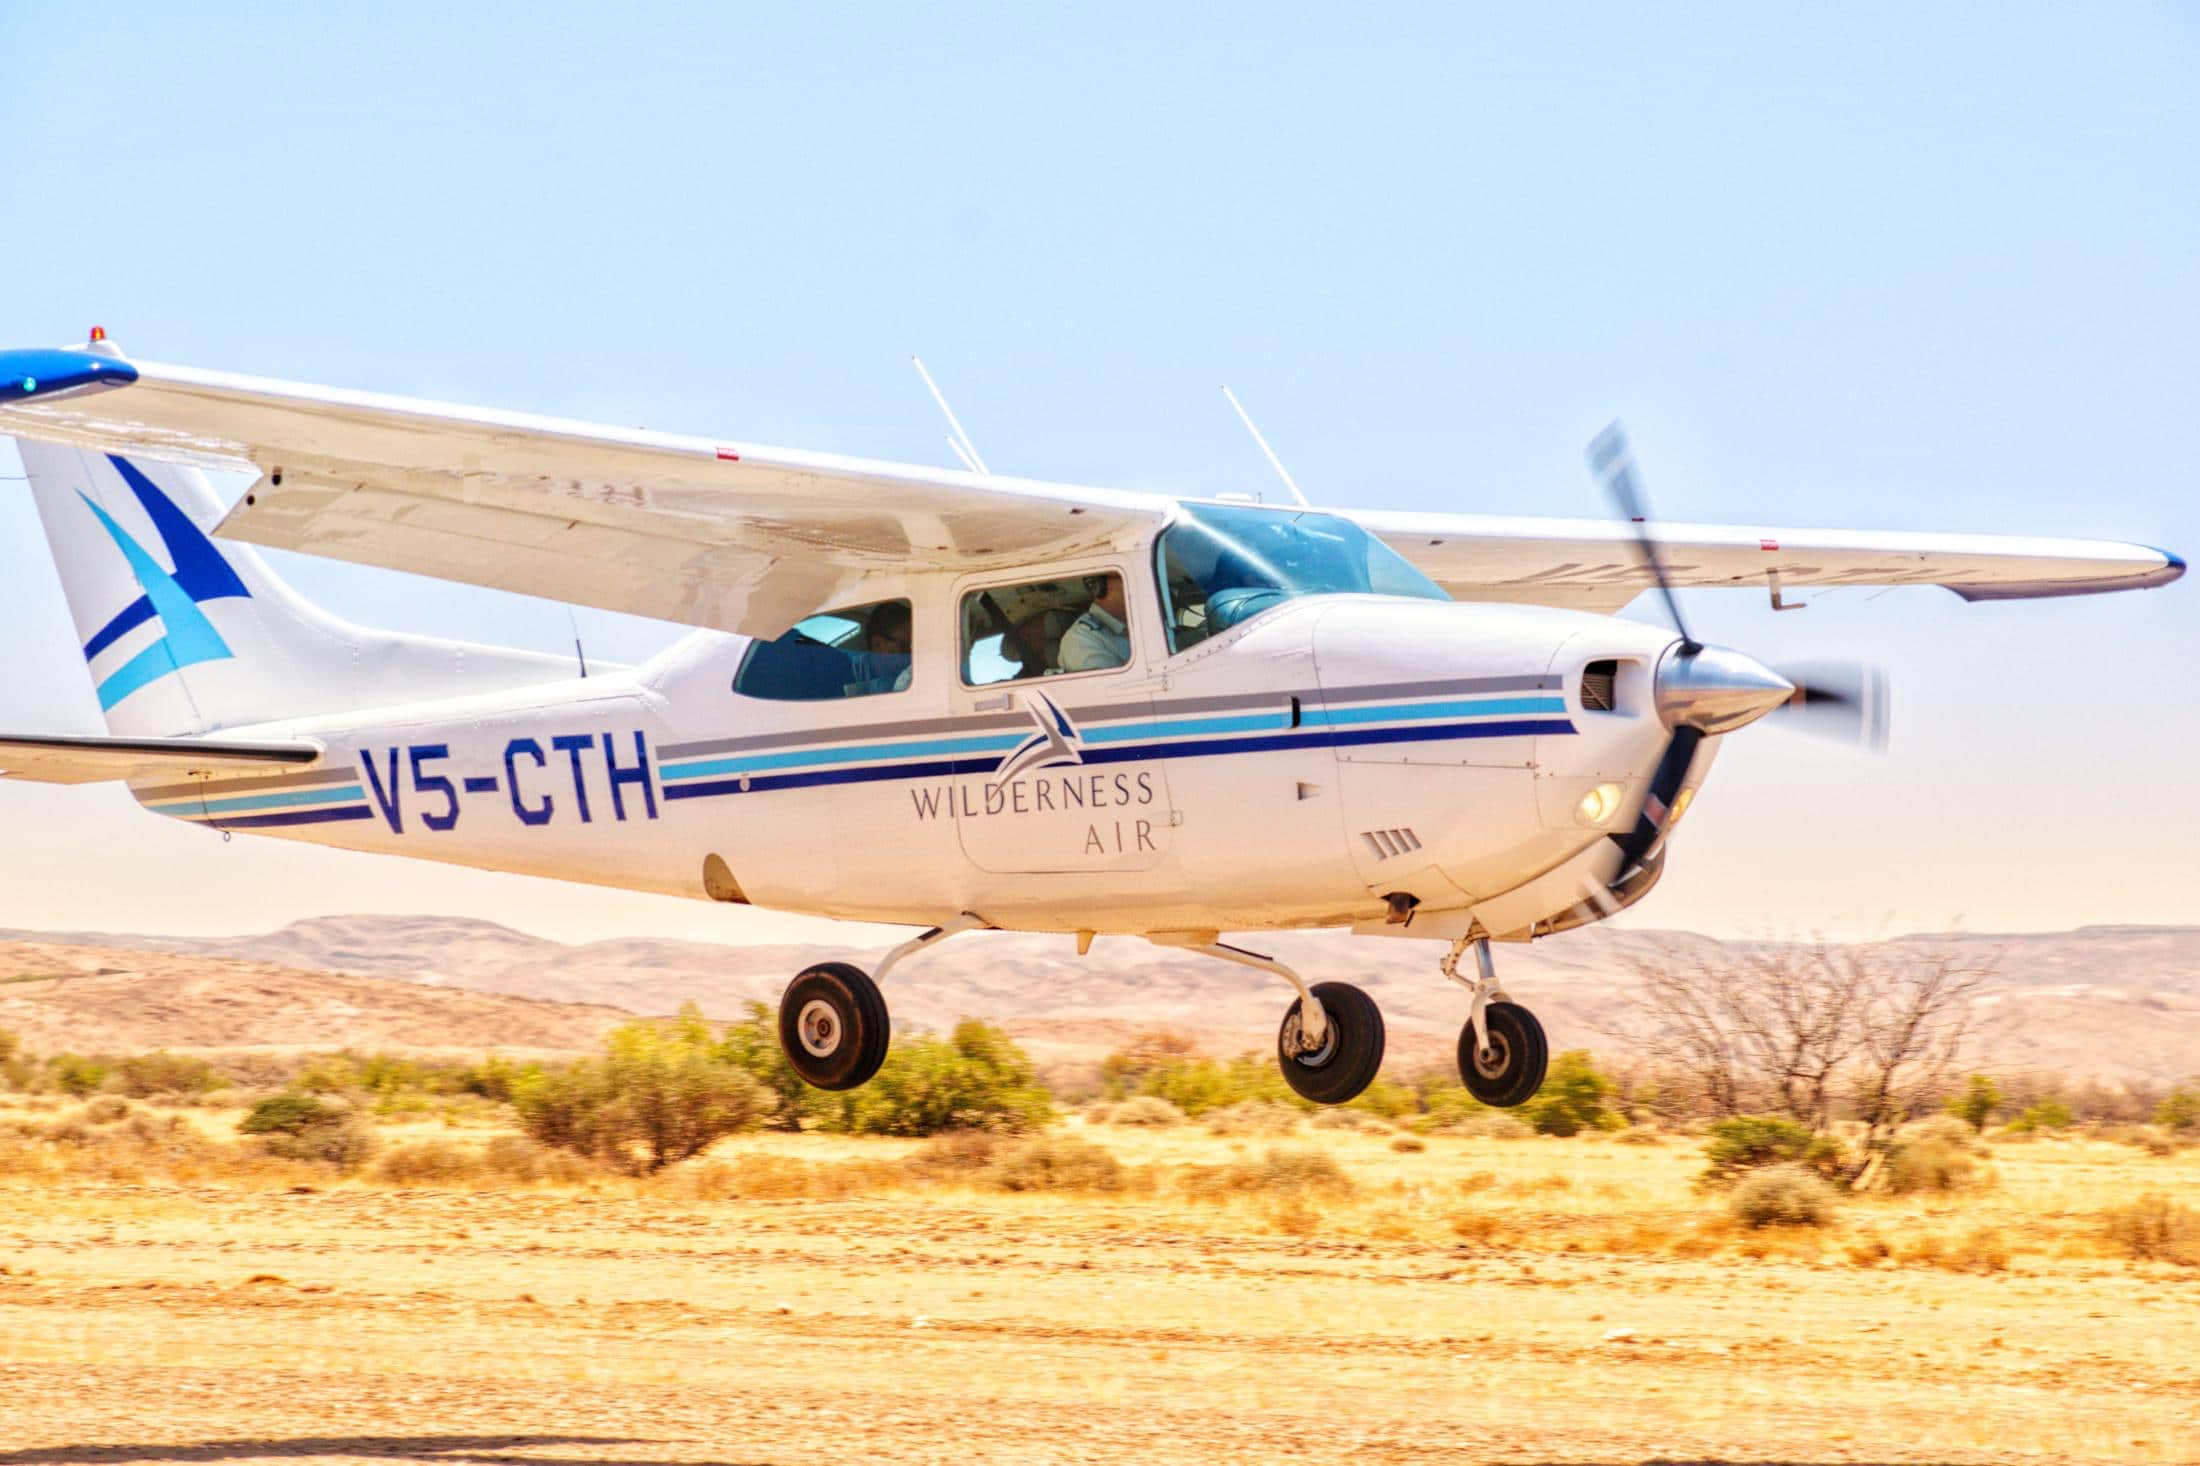 Luxe reizen Namibië - Fly-in safari's in Namibië met Wilderness Air.